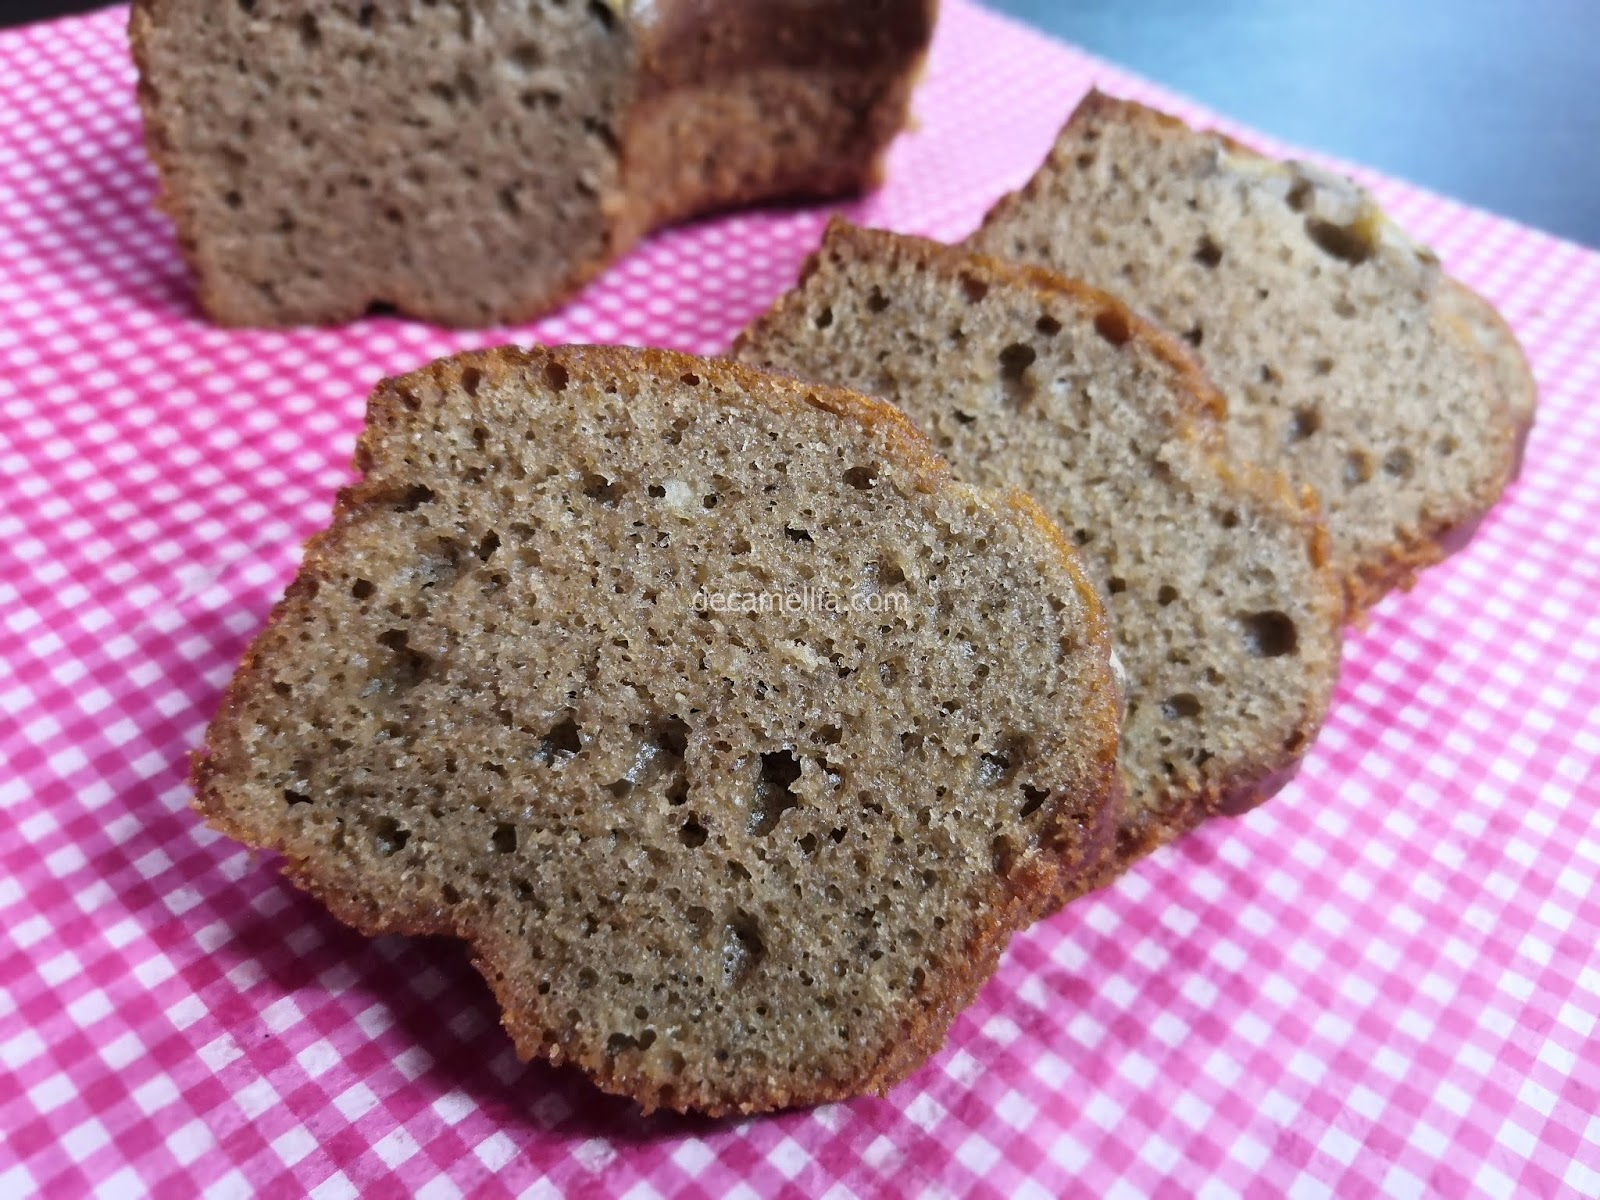 resepi kek coklat gebu kukus  kartasura Resepi Kek Pisang Azie Kitchen Enak dan Mudah